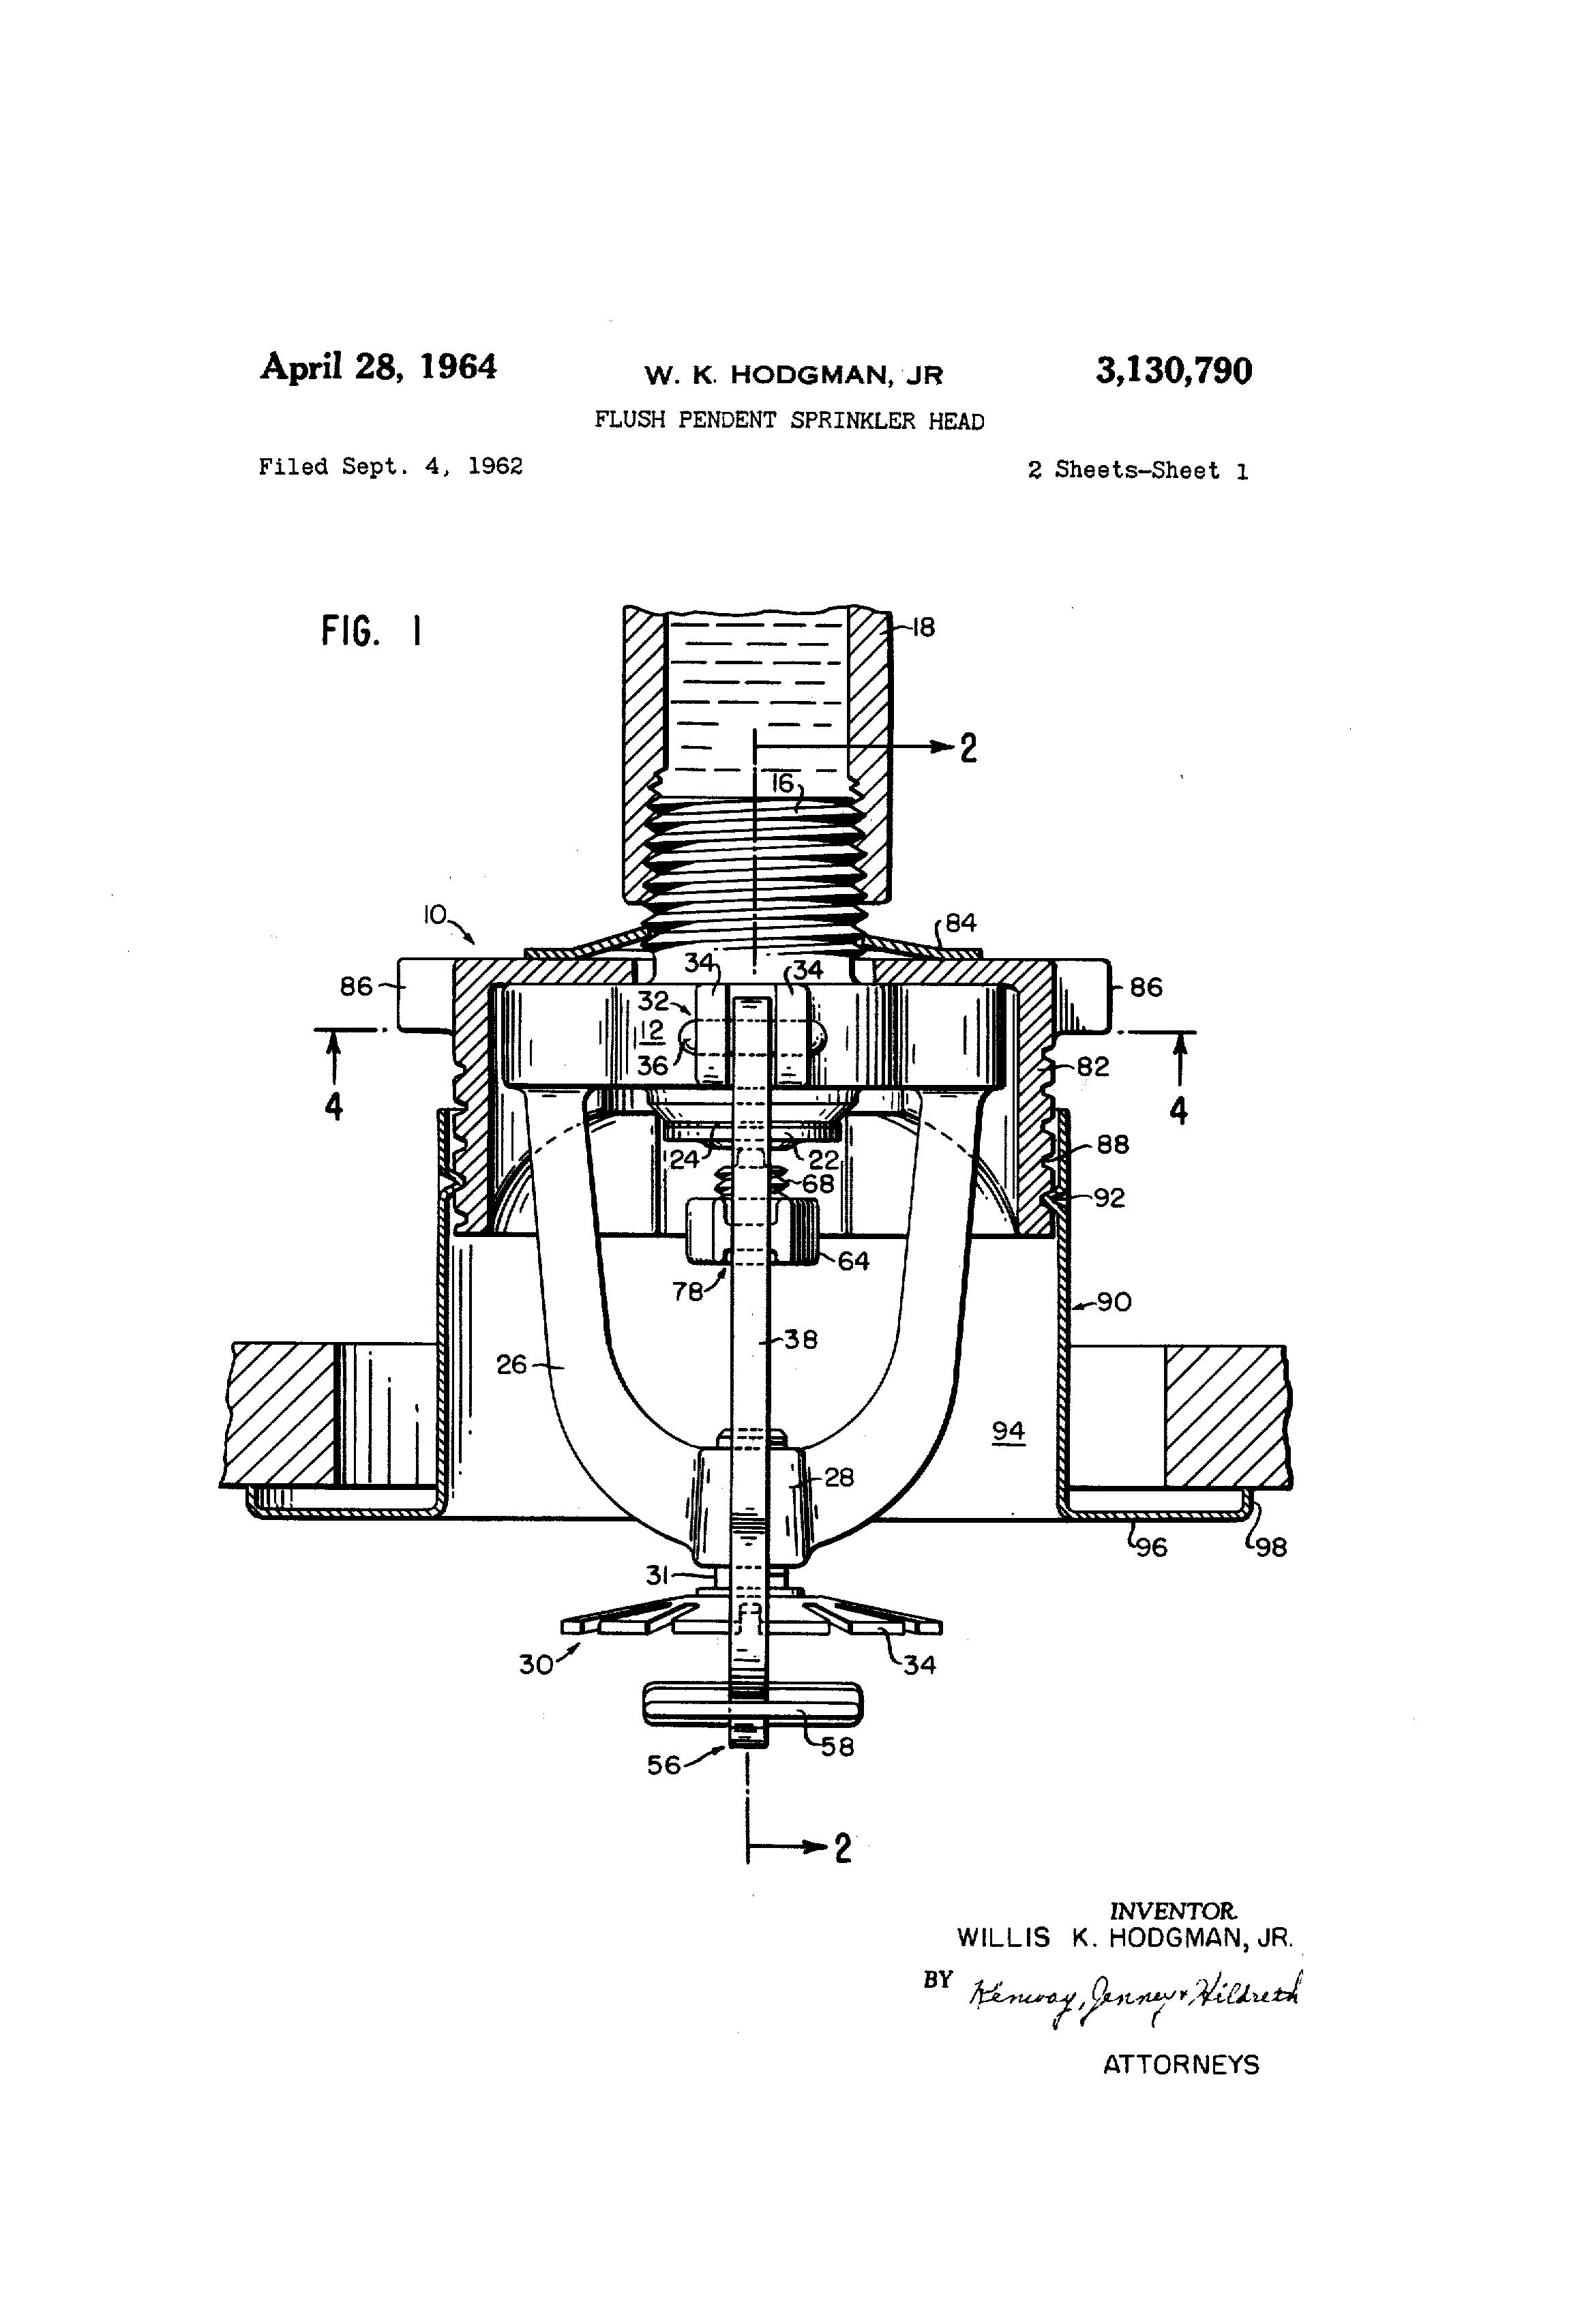 fire sprinkler head parts diagram